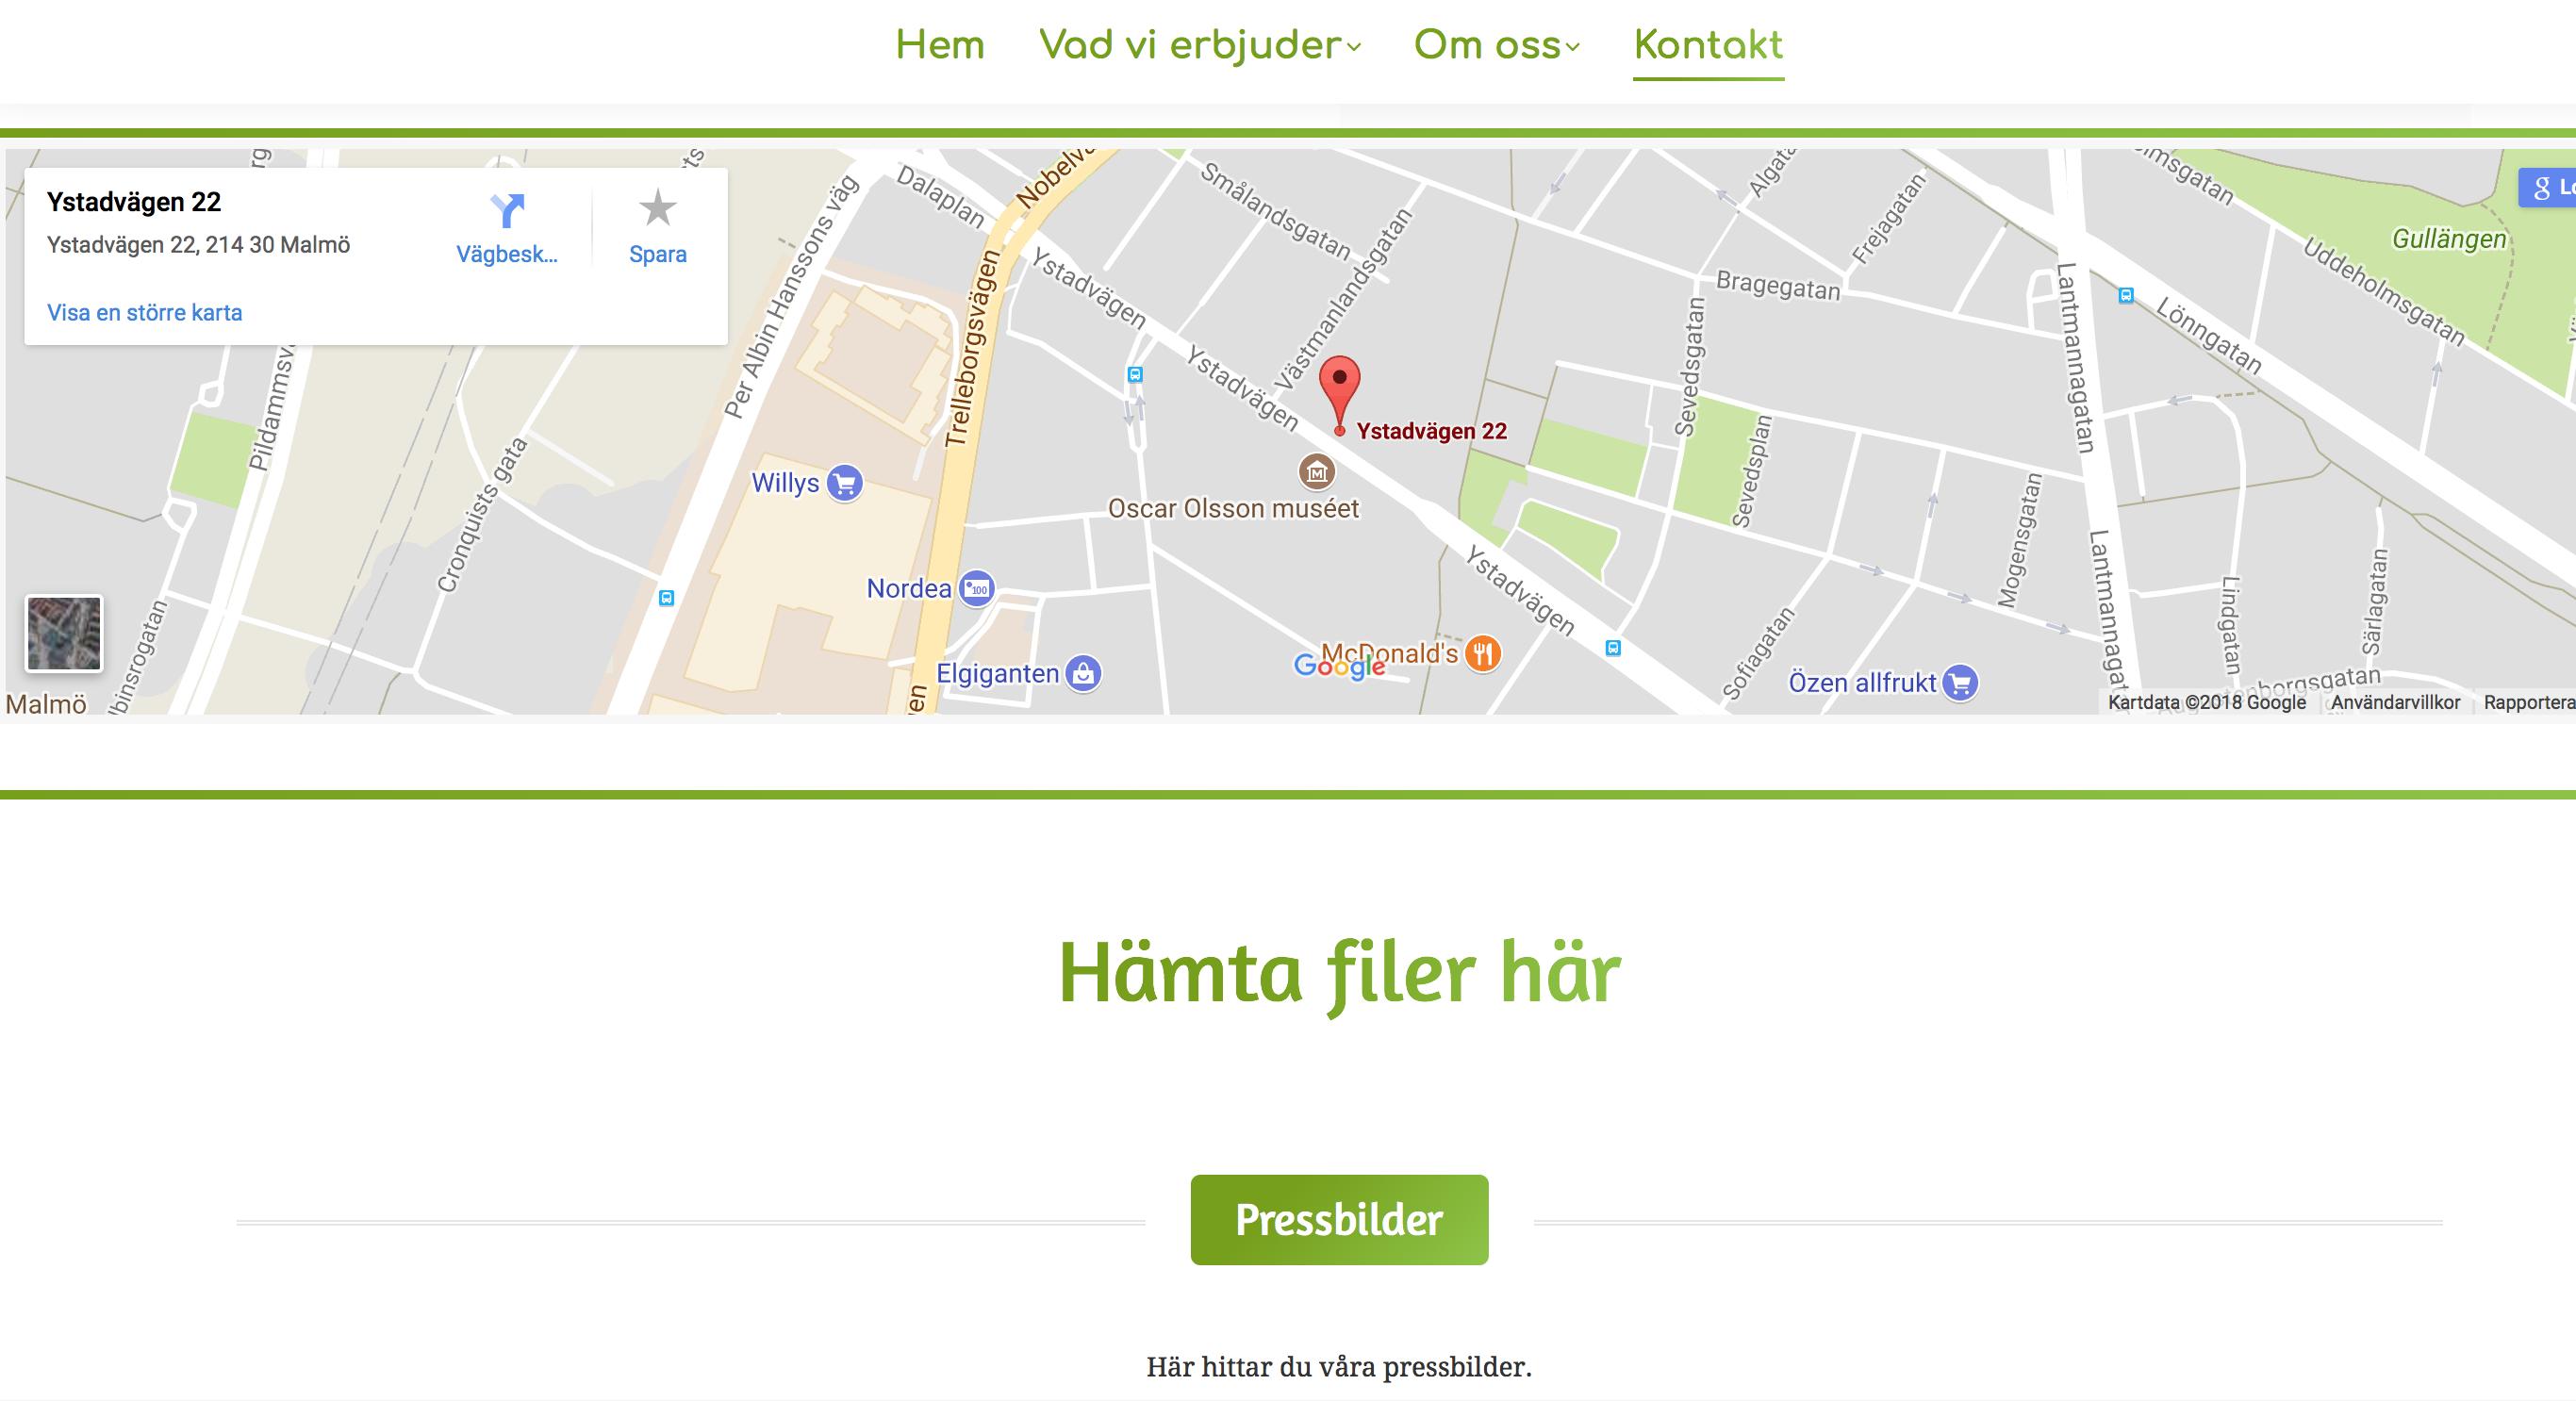 Viljakompetensutveckling.se-Kontaktsida-Google-Maps